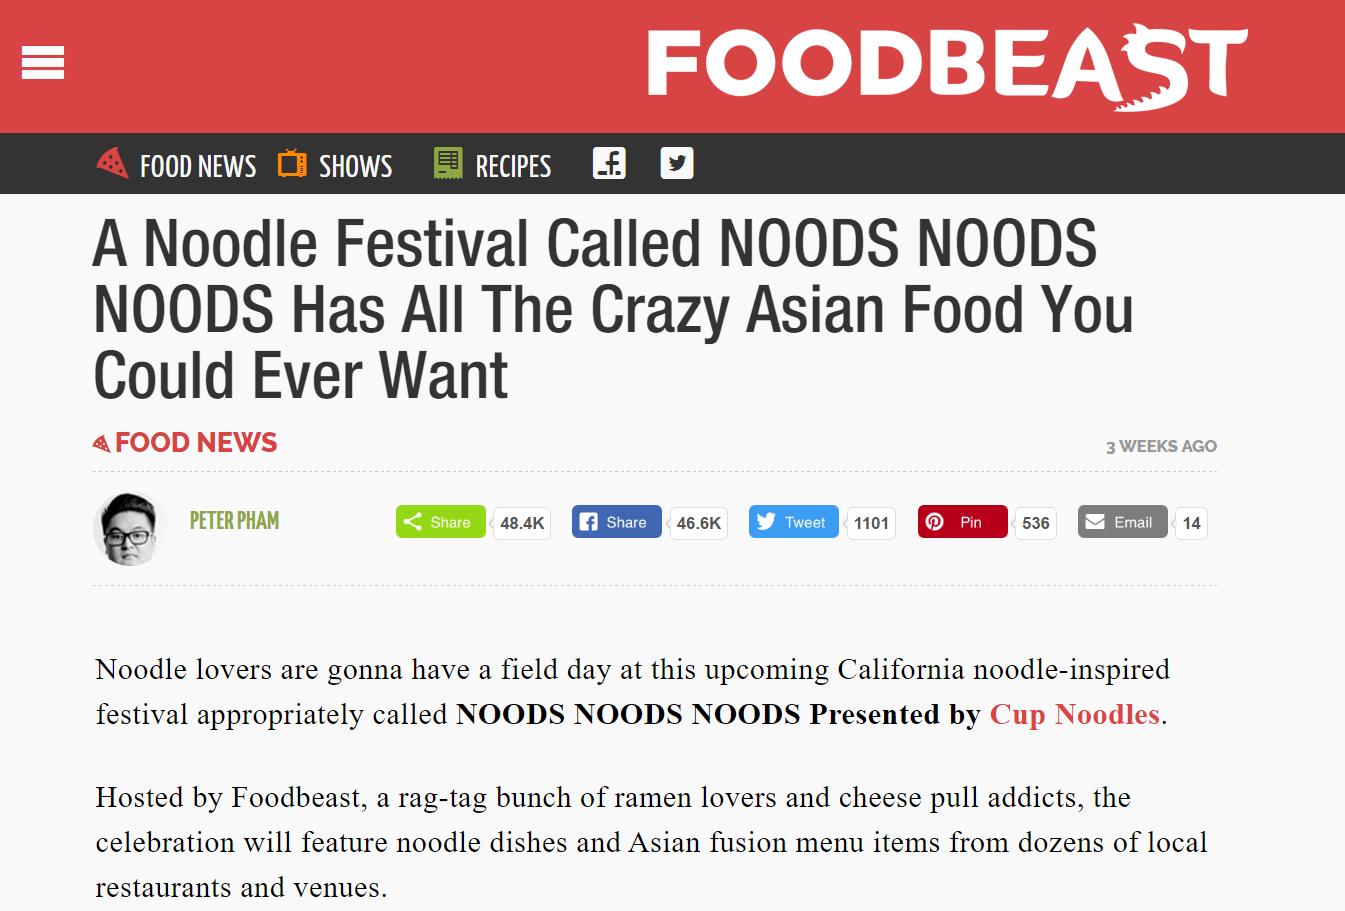 Foodbeast: Noods Noods Noods Festival 2017  (READ HERE)